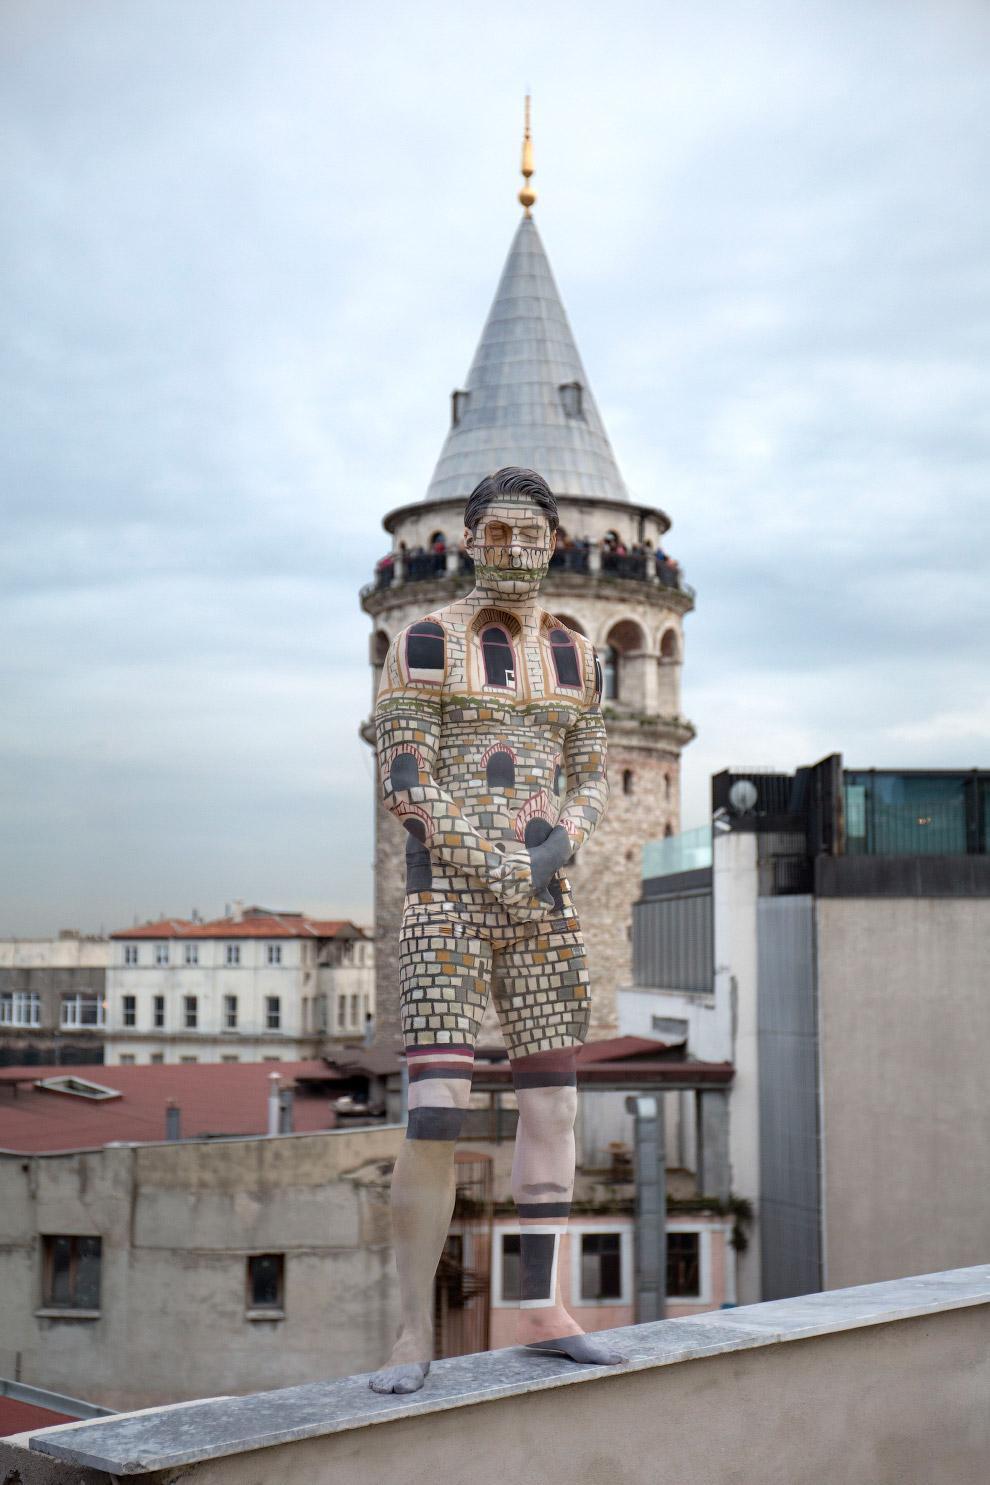 Гала́тская башня